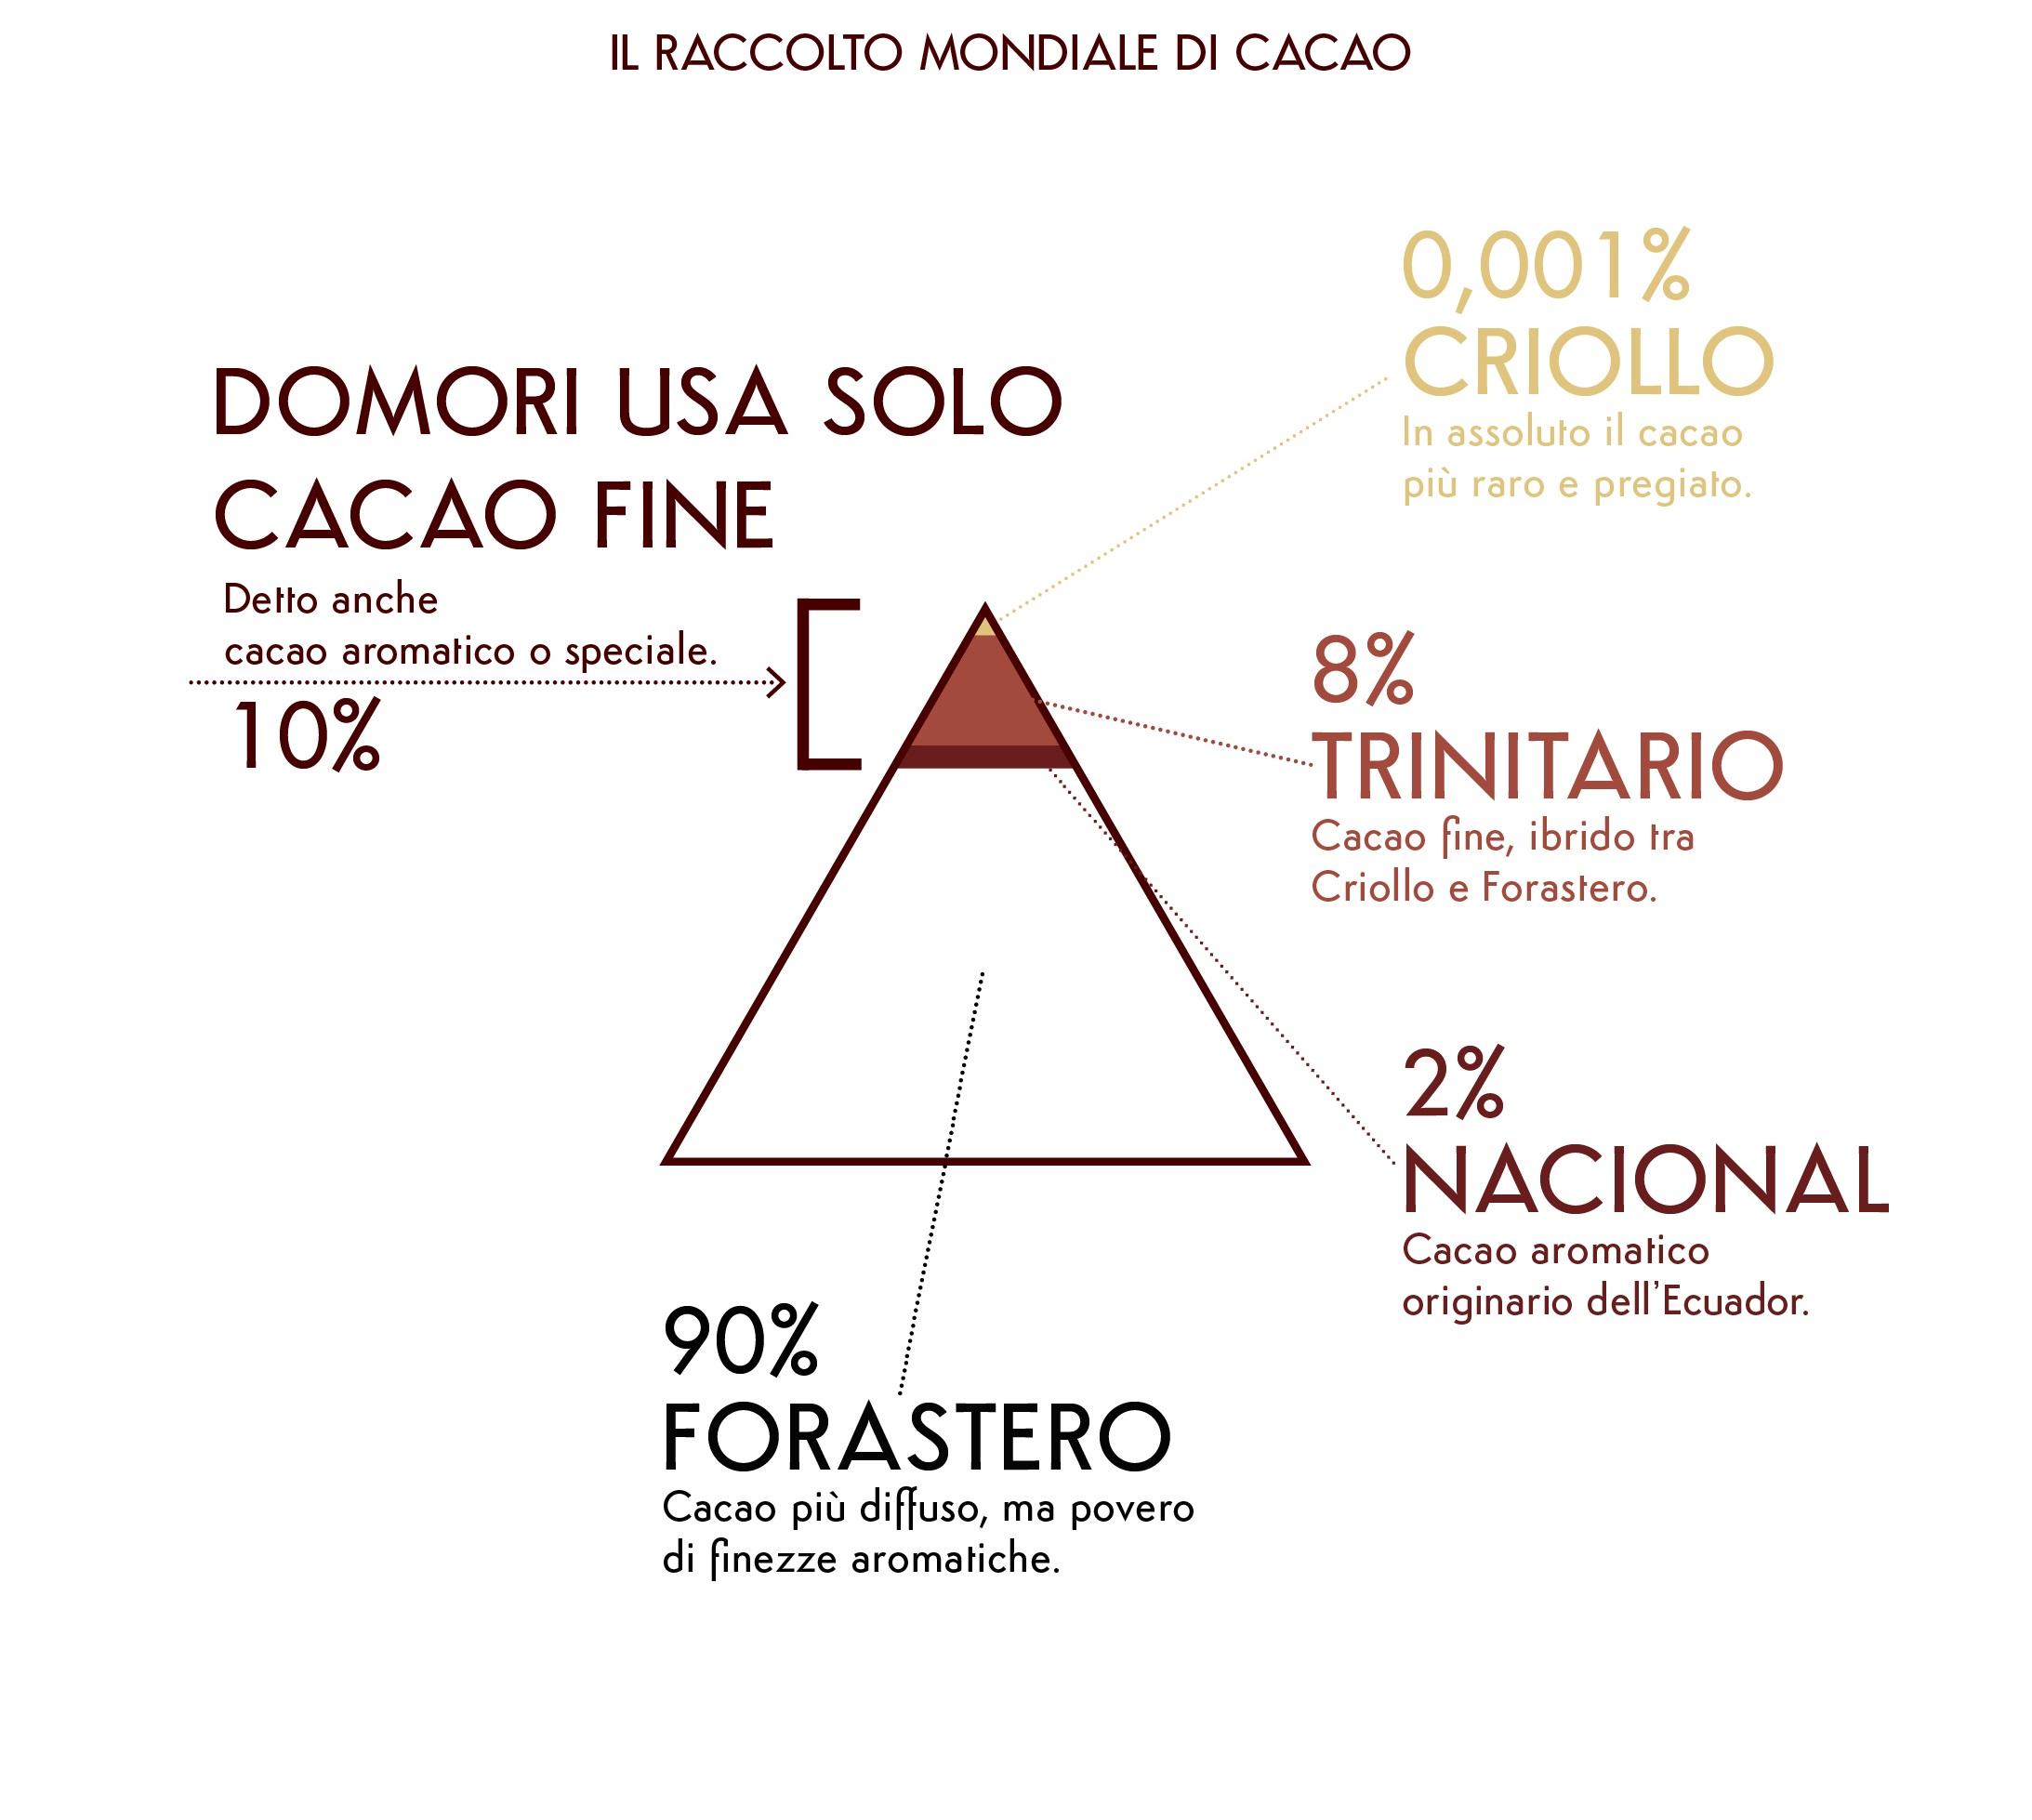 piramide_modificata-01-dettagli.jpg